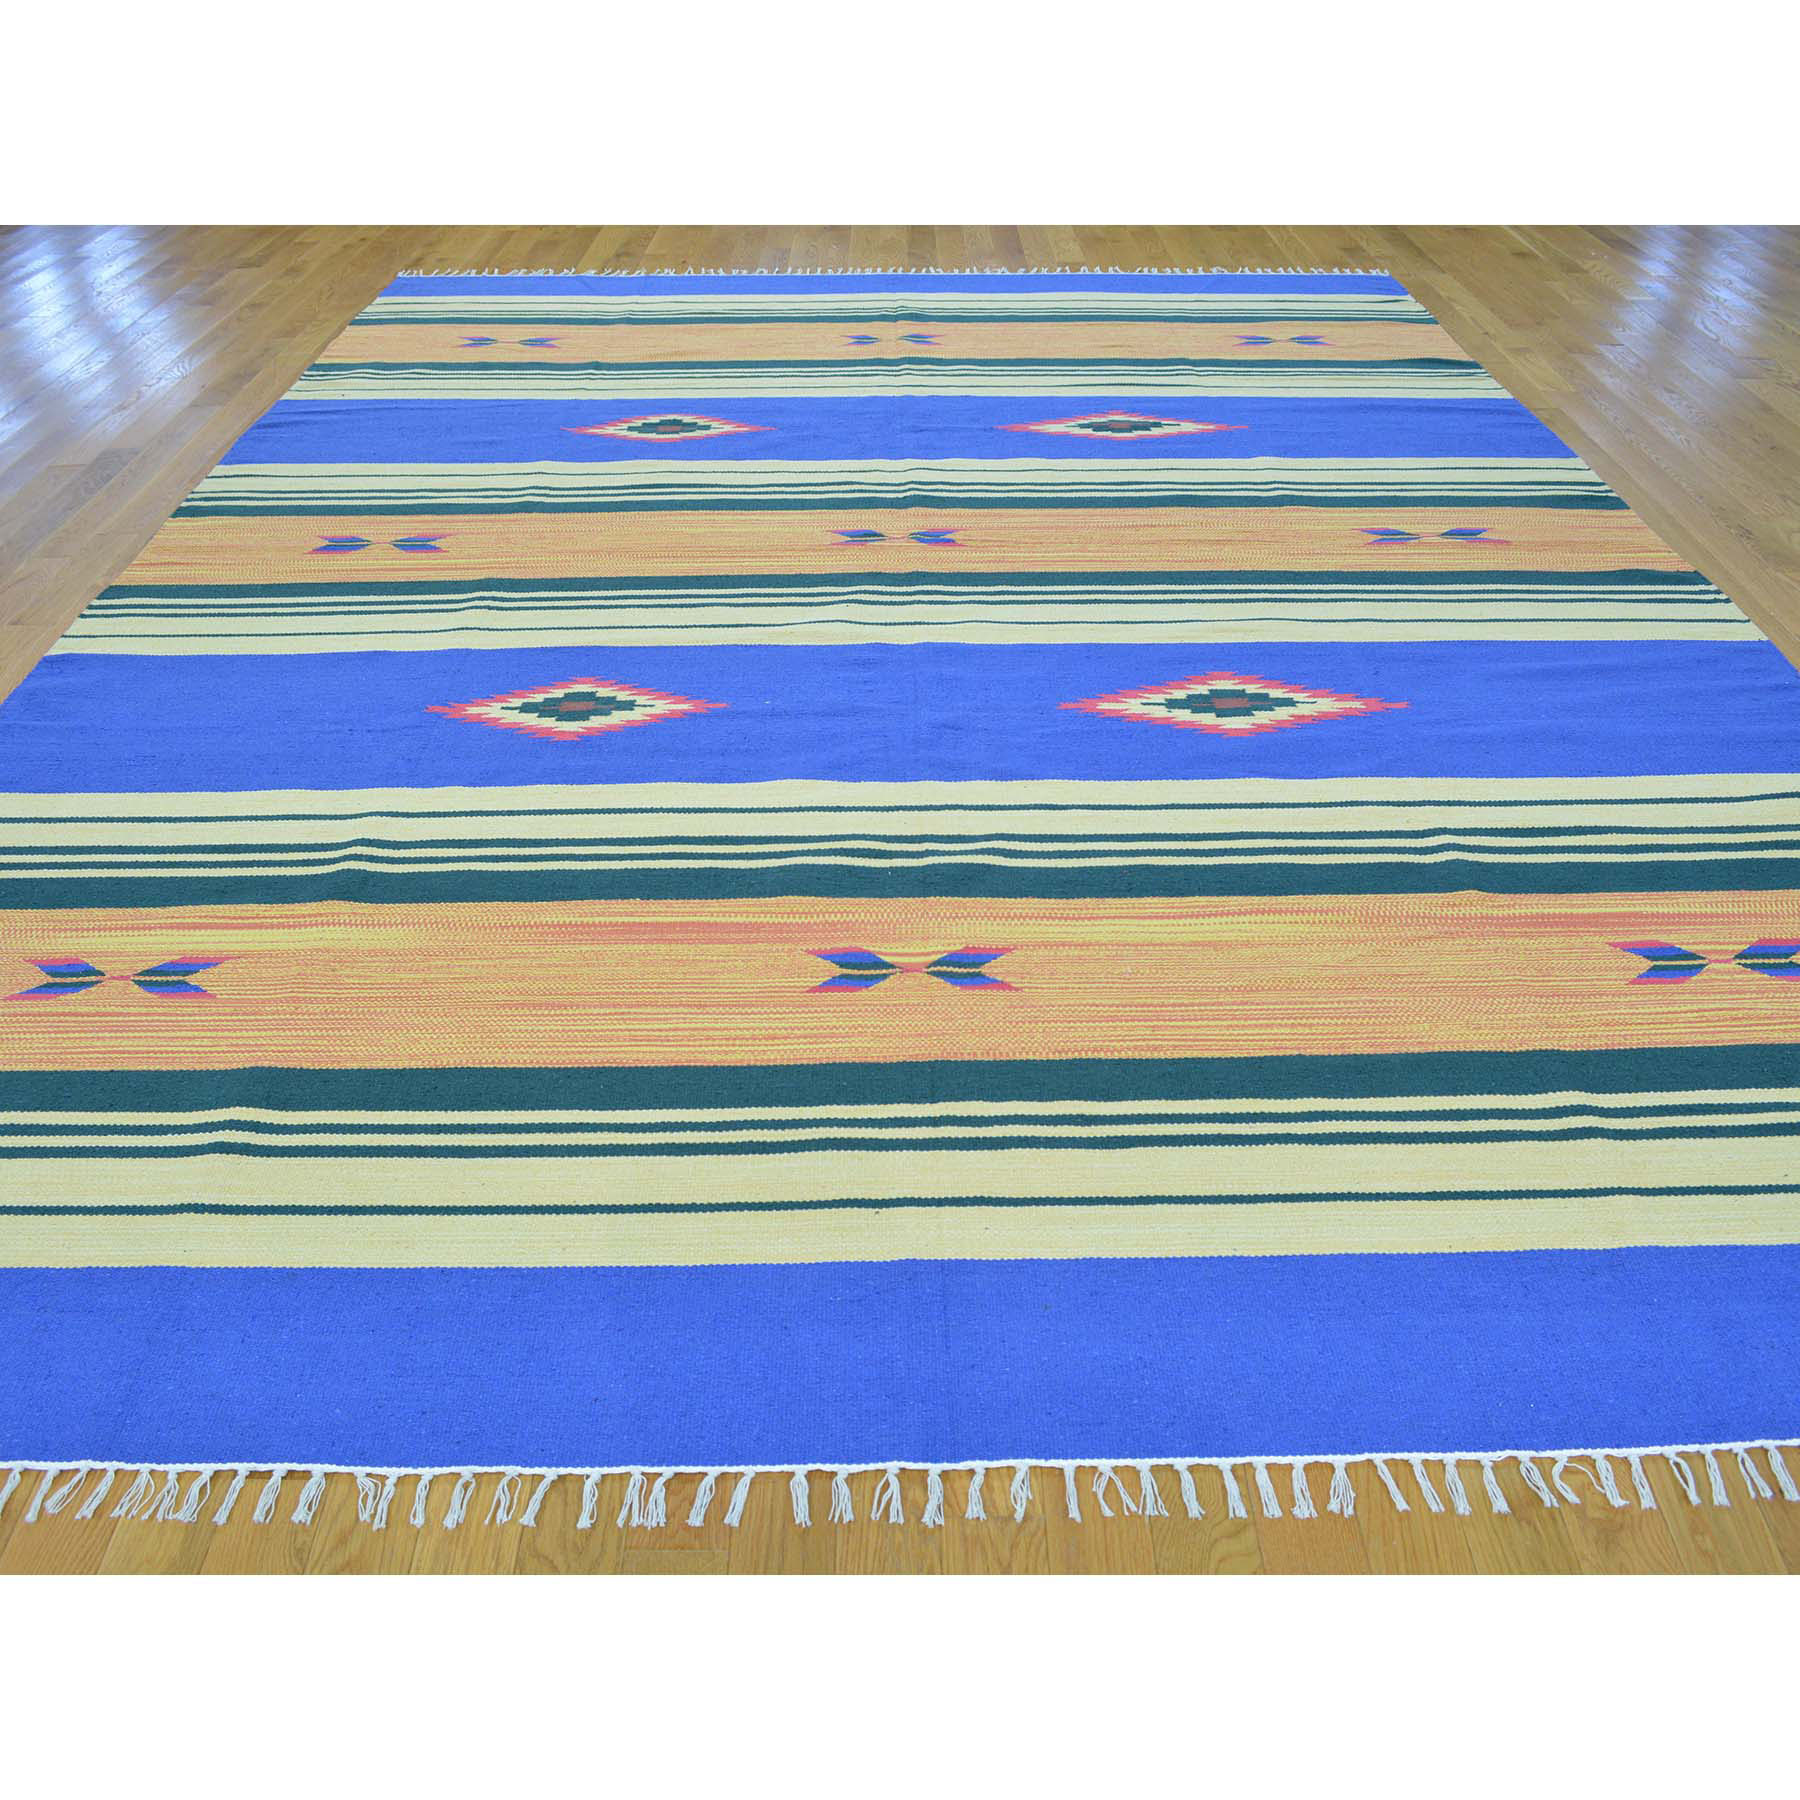 8-10 x12-1  Flat Weave Hand Woven Killim Southwestern Design Rug